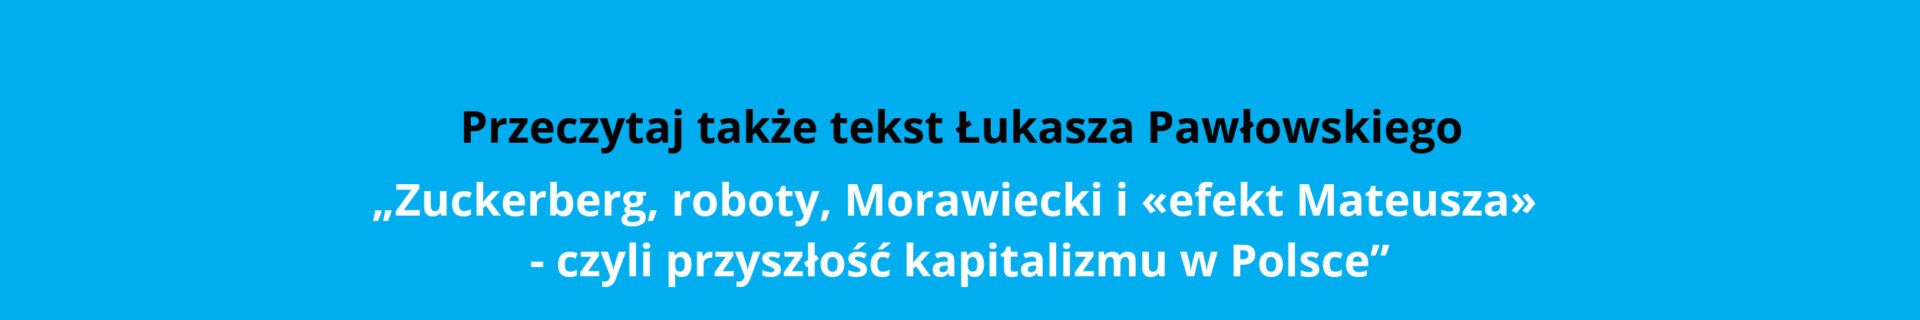 pawlowski (3)